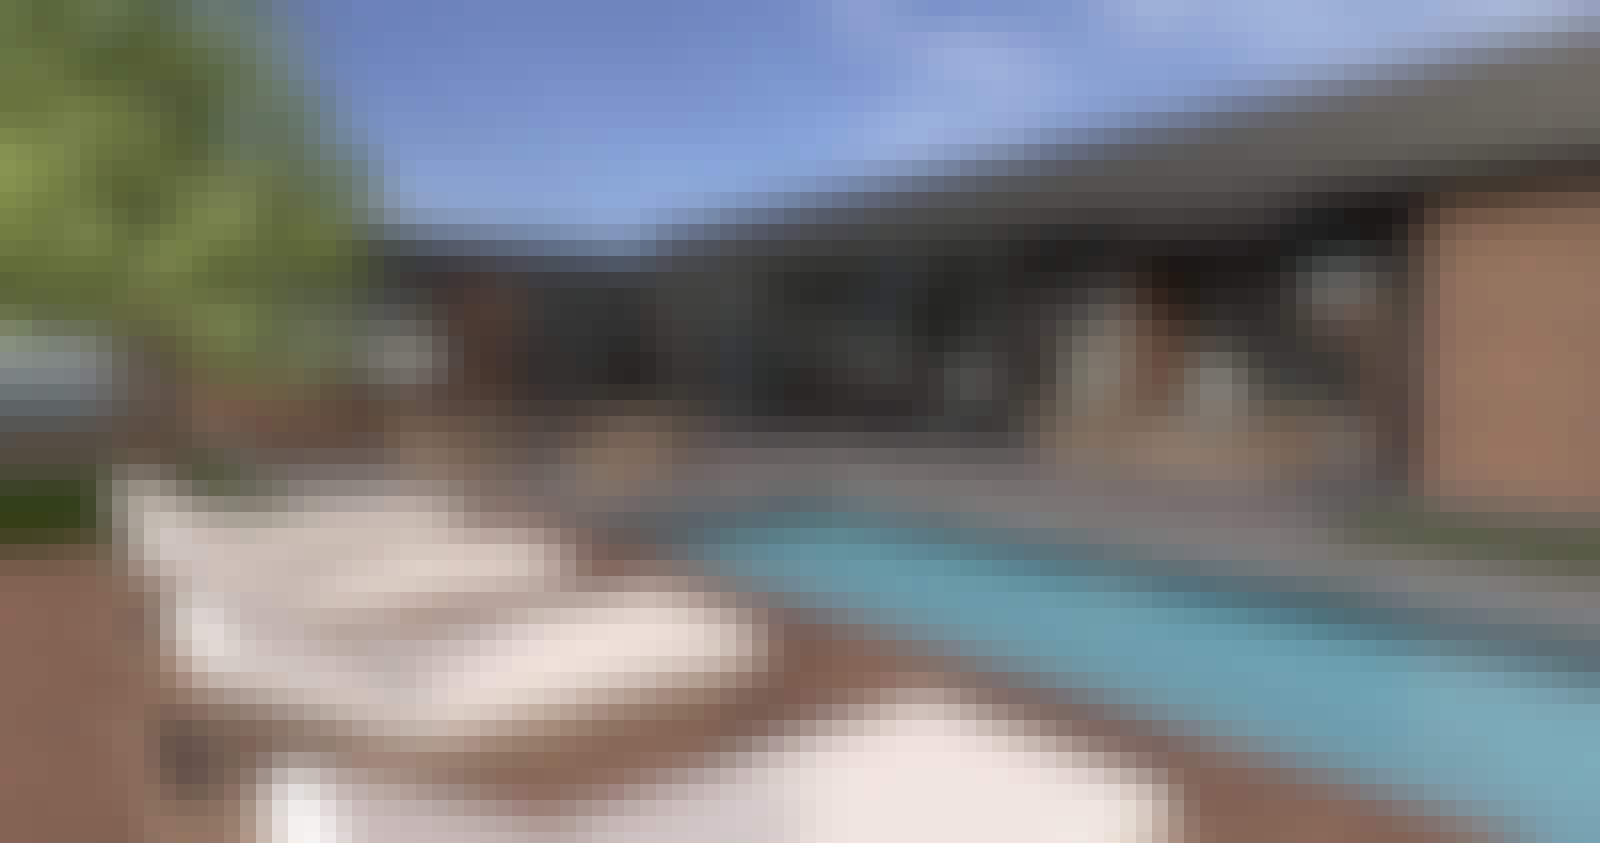 Photorealistic rendering of SketchUp model